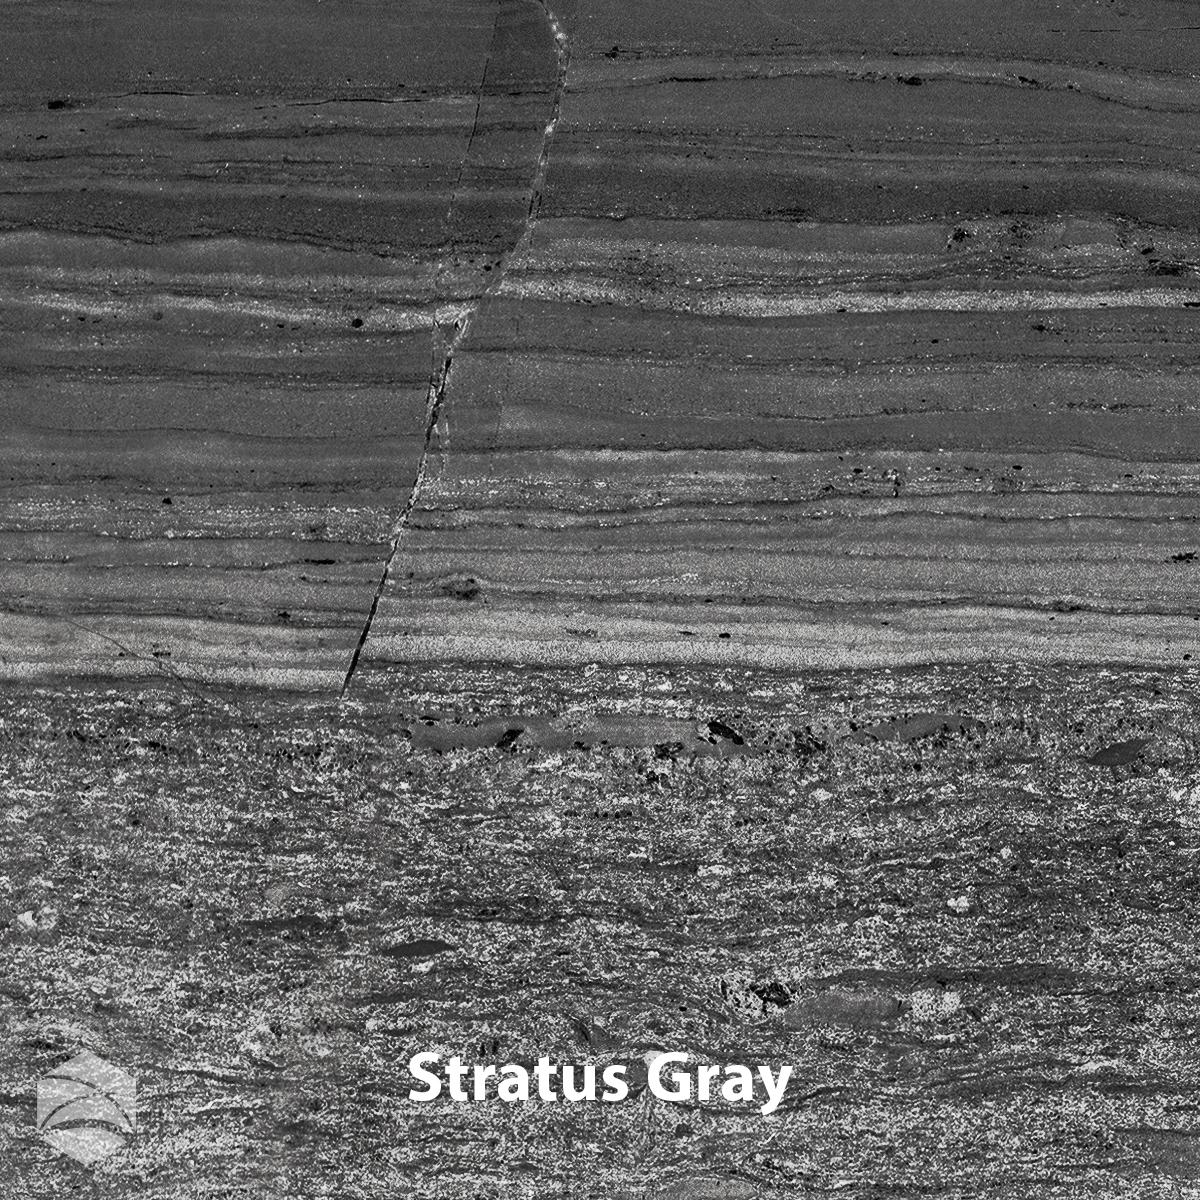 Stratus Gray_V2_12x12.jpg